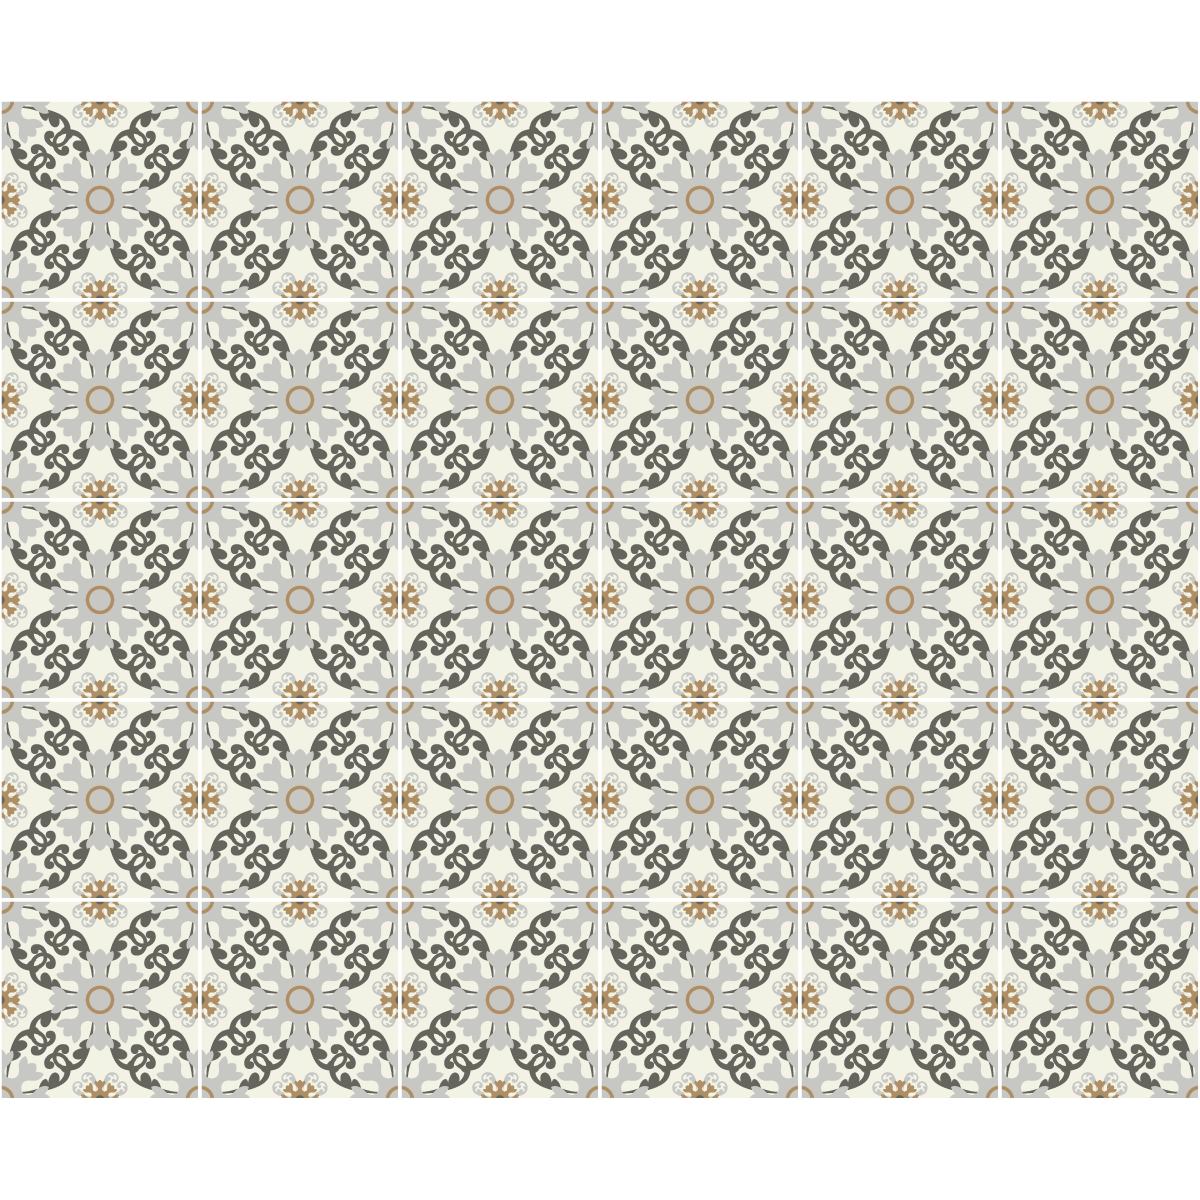 30 stickers carreaux de ciment azulejos belmiro cuisine. Black Bedroom Furniture Sets. Home Design Ideas